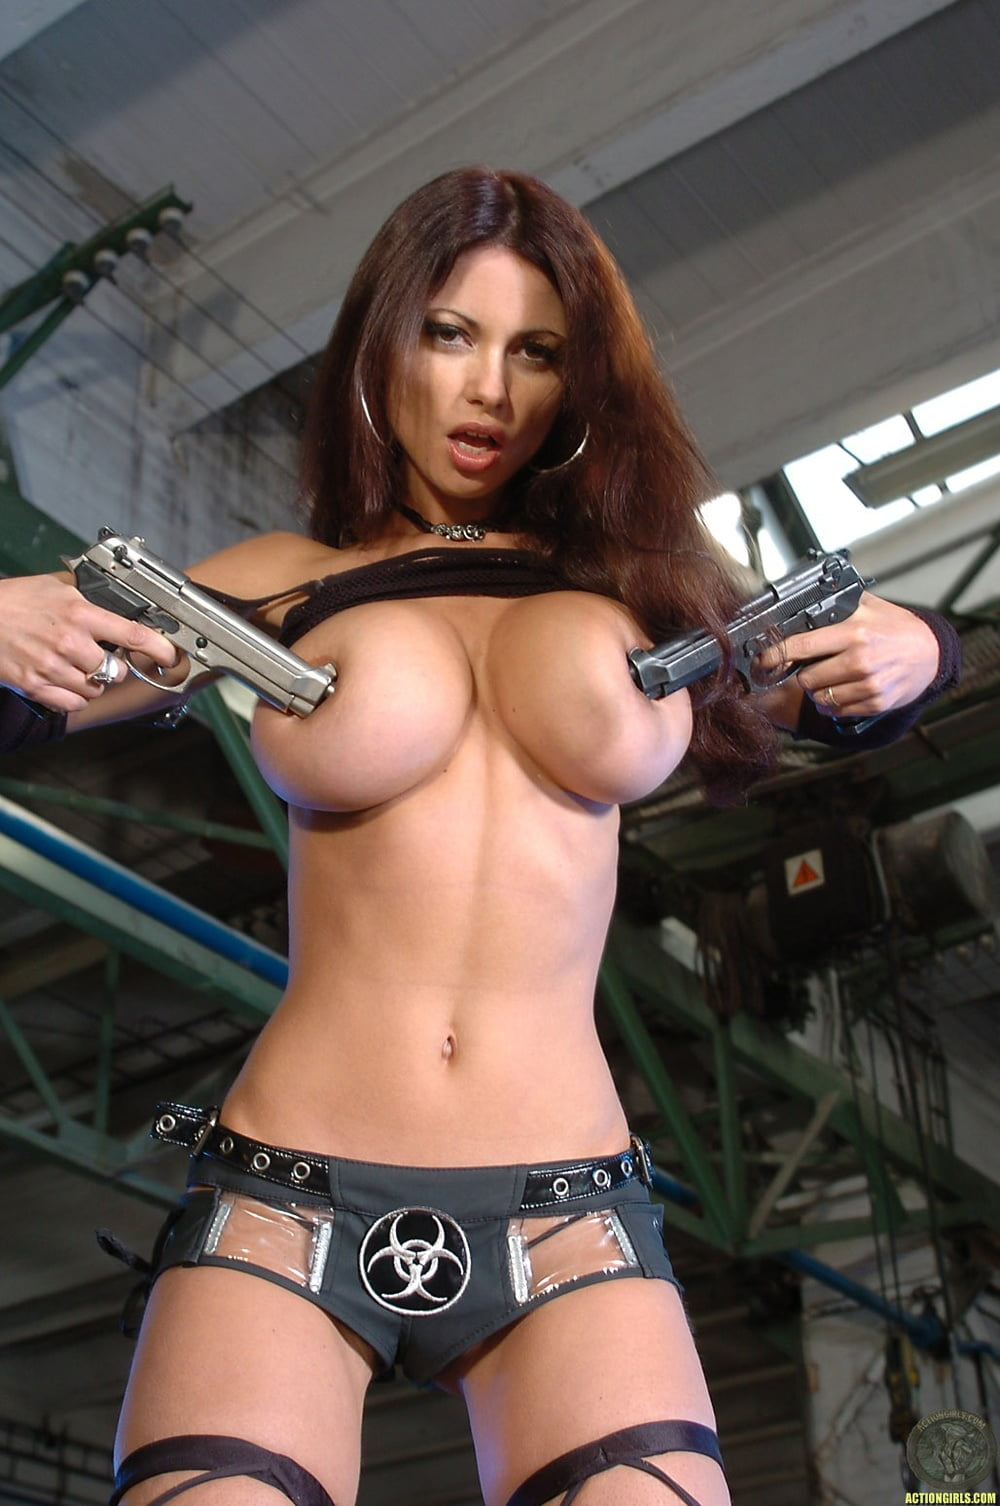 Naked girls with gun pics — img 2